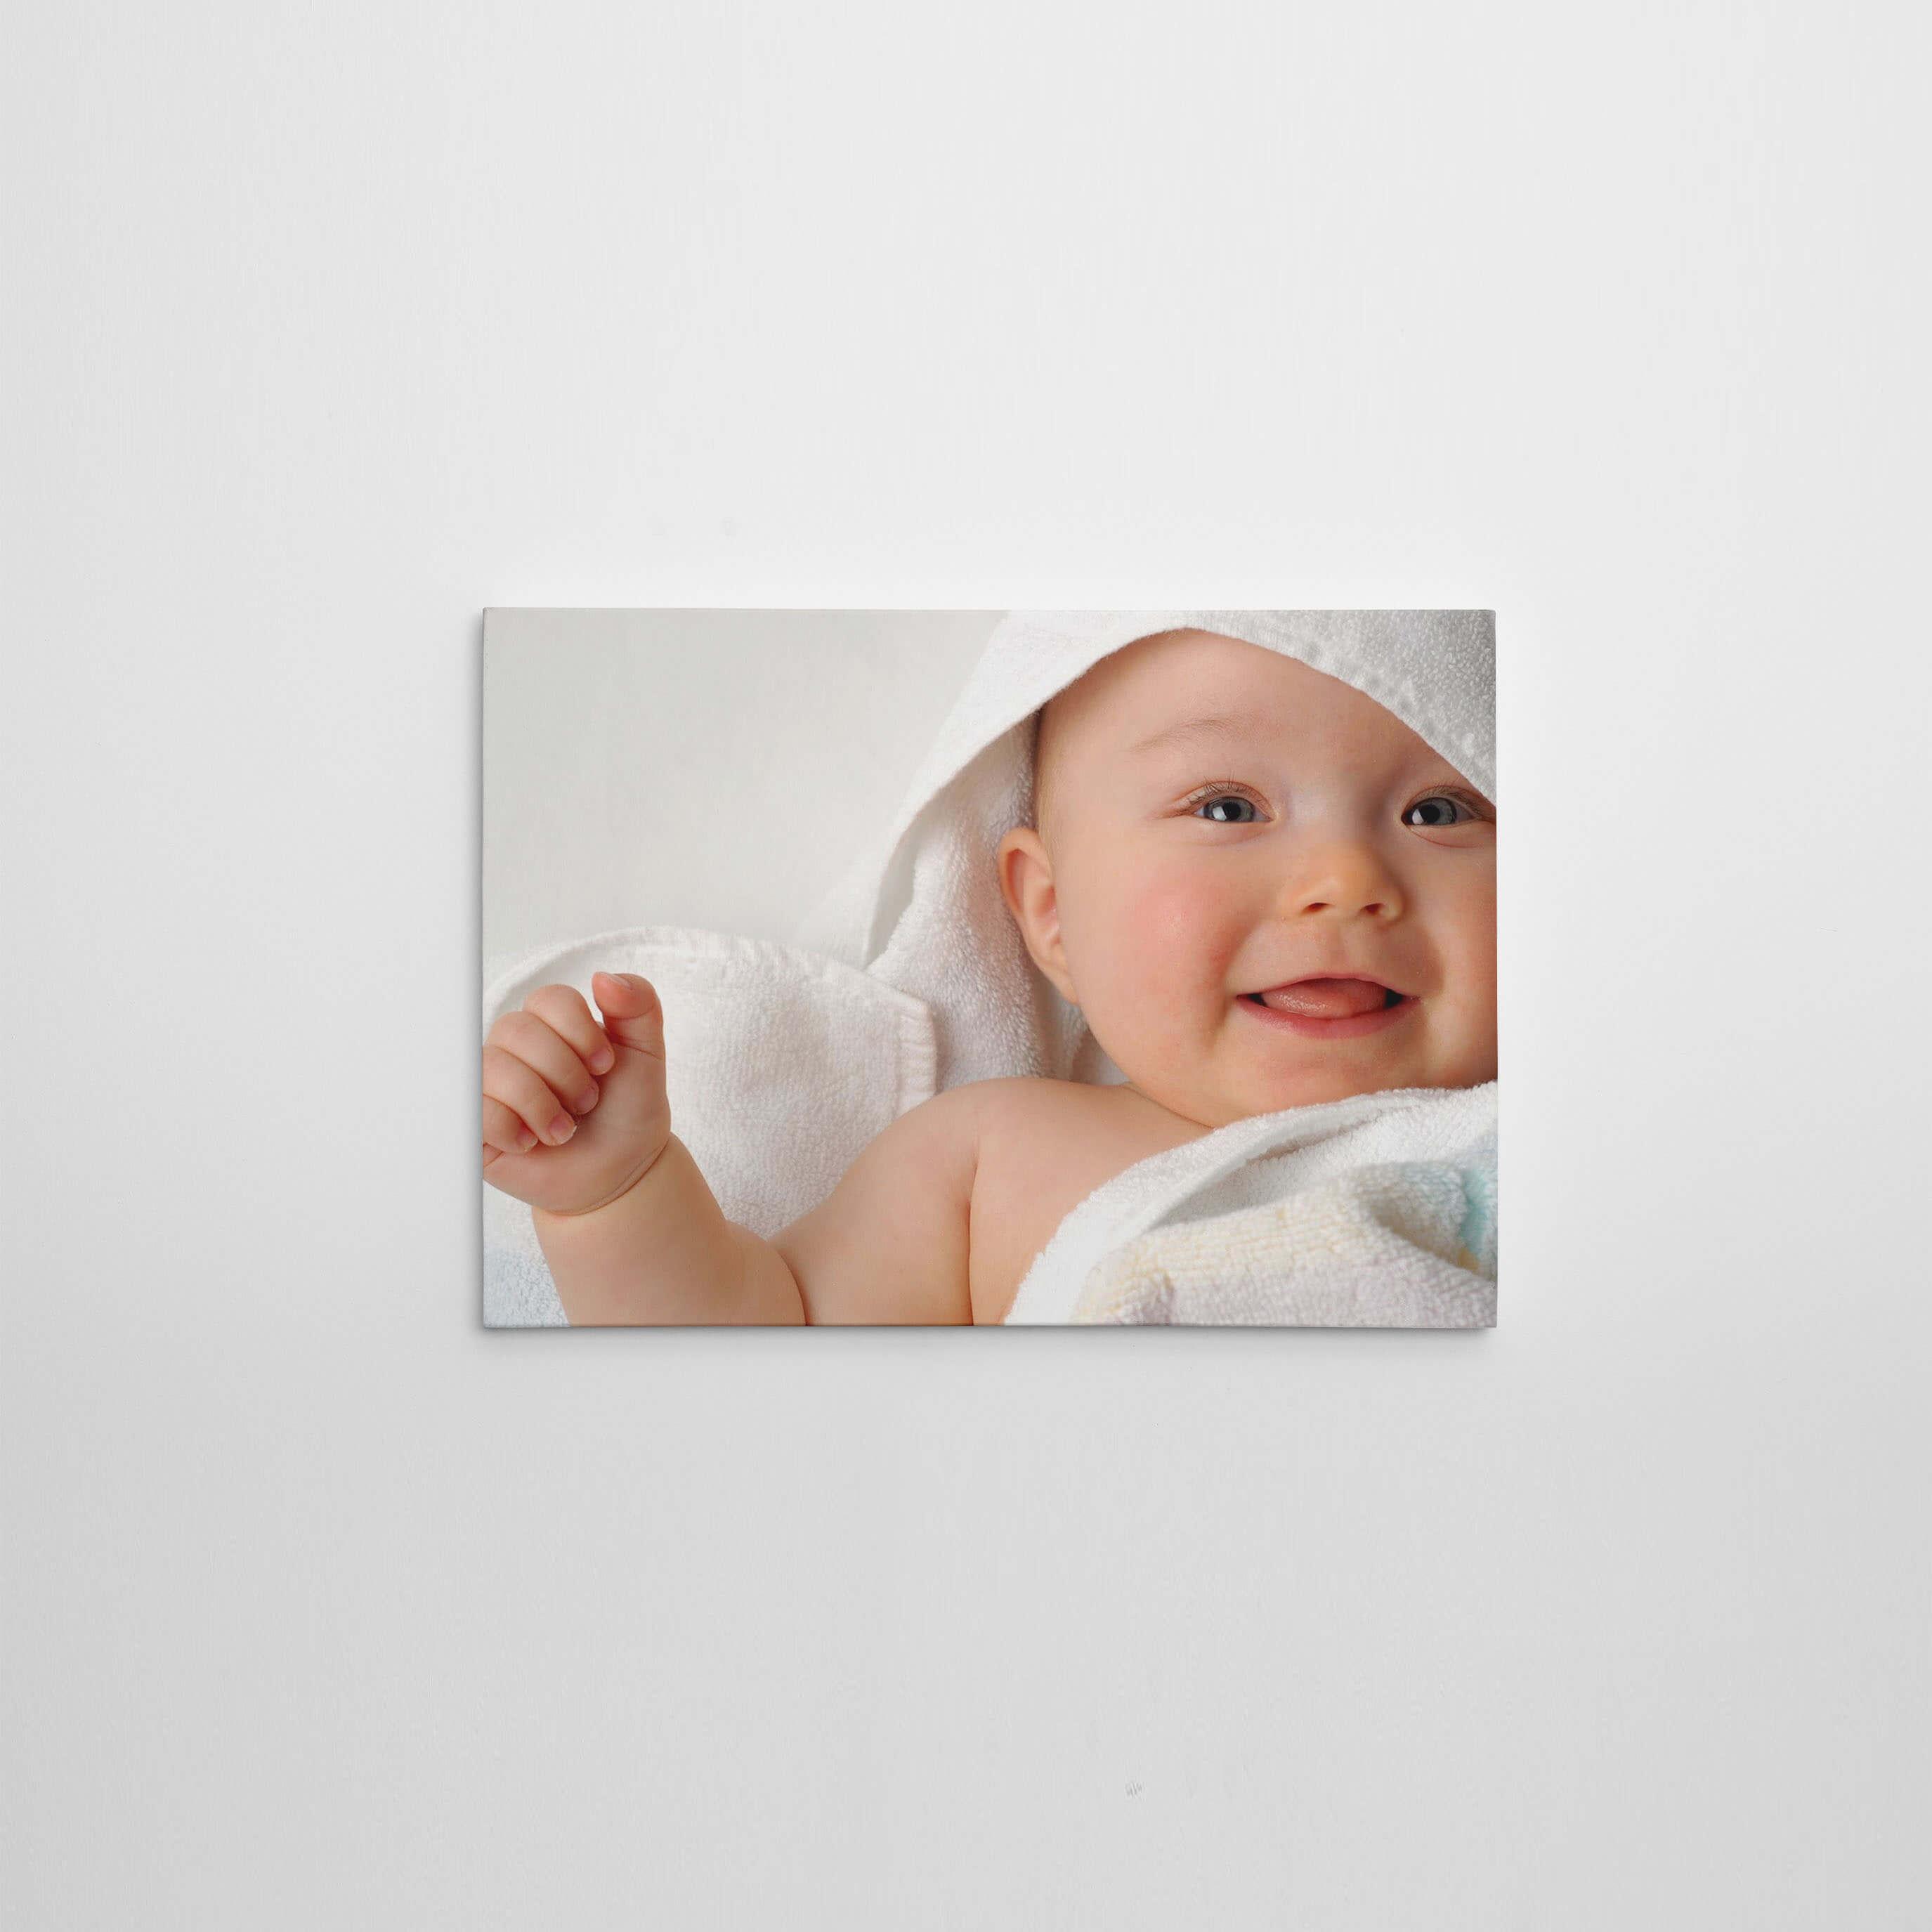 Kids and Babies Canvas Prints Idea